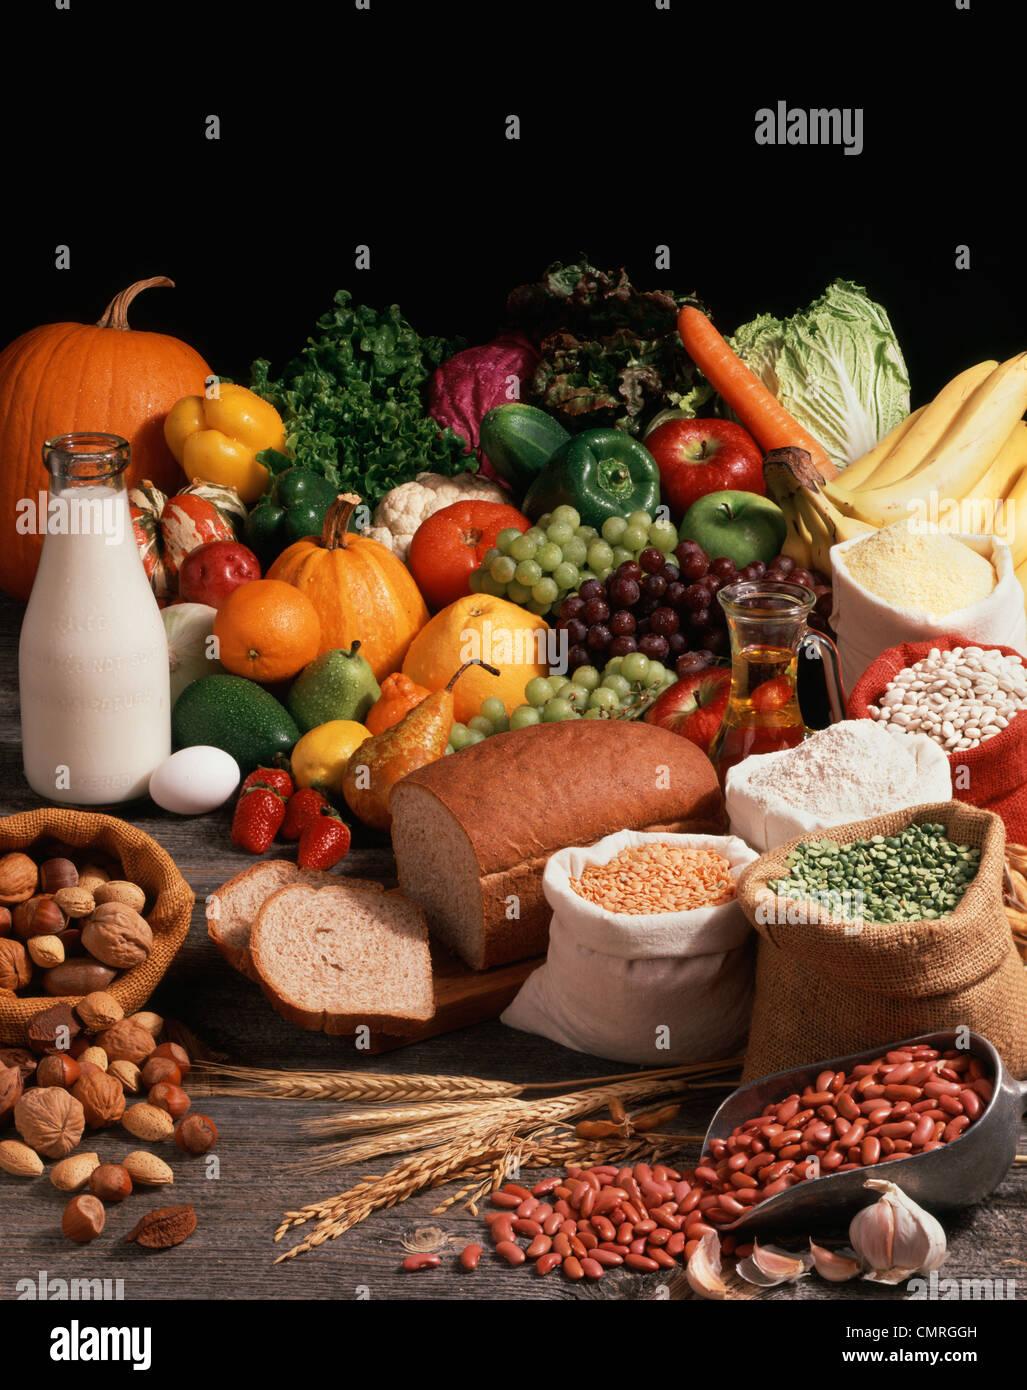 1990s lacto ovo vegetarian food groups milk eggs legumes